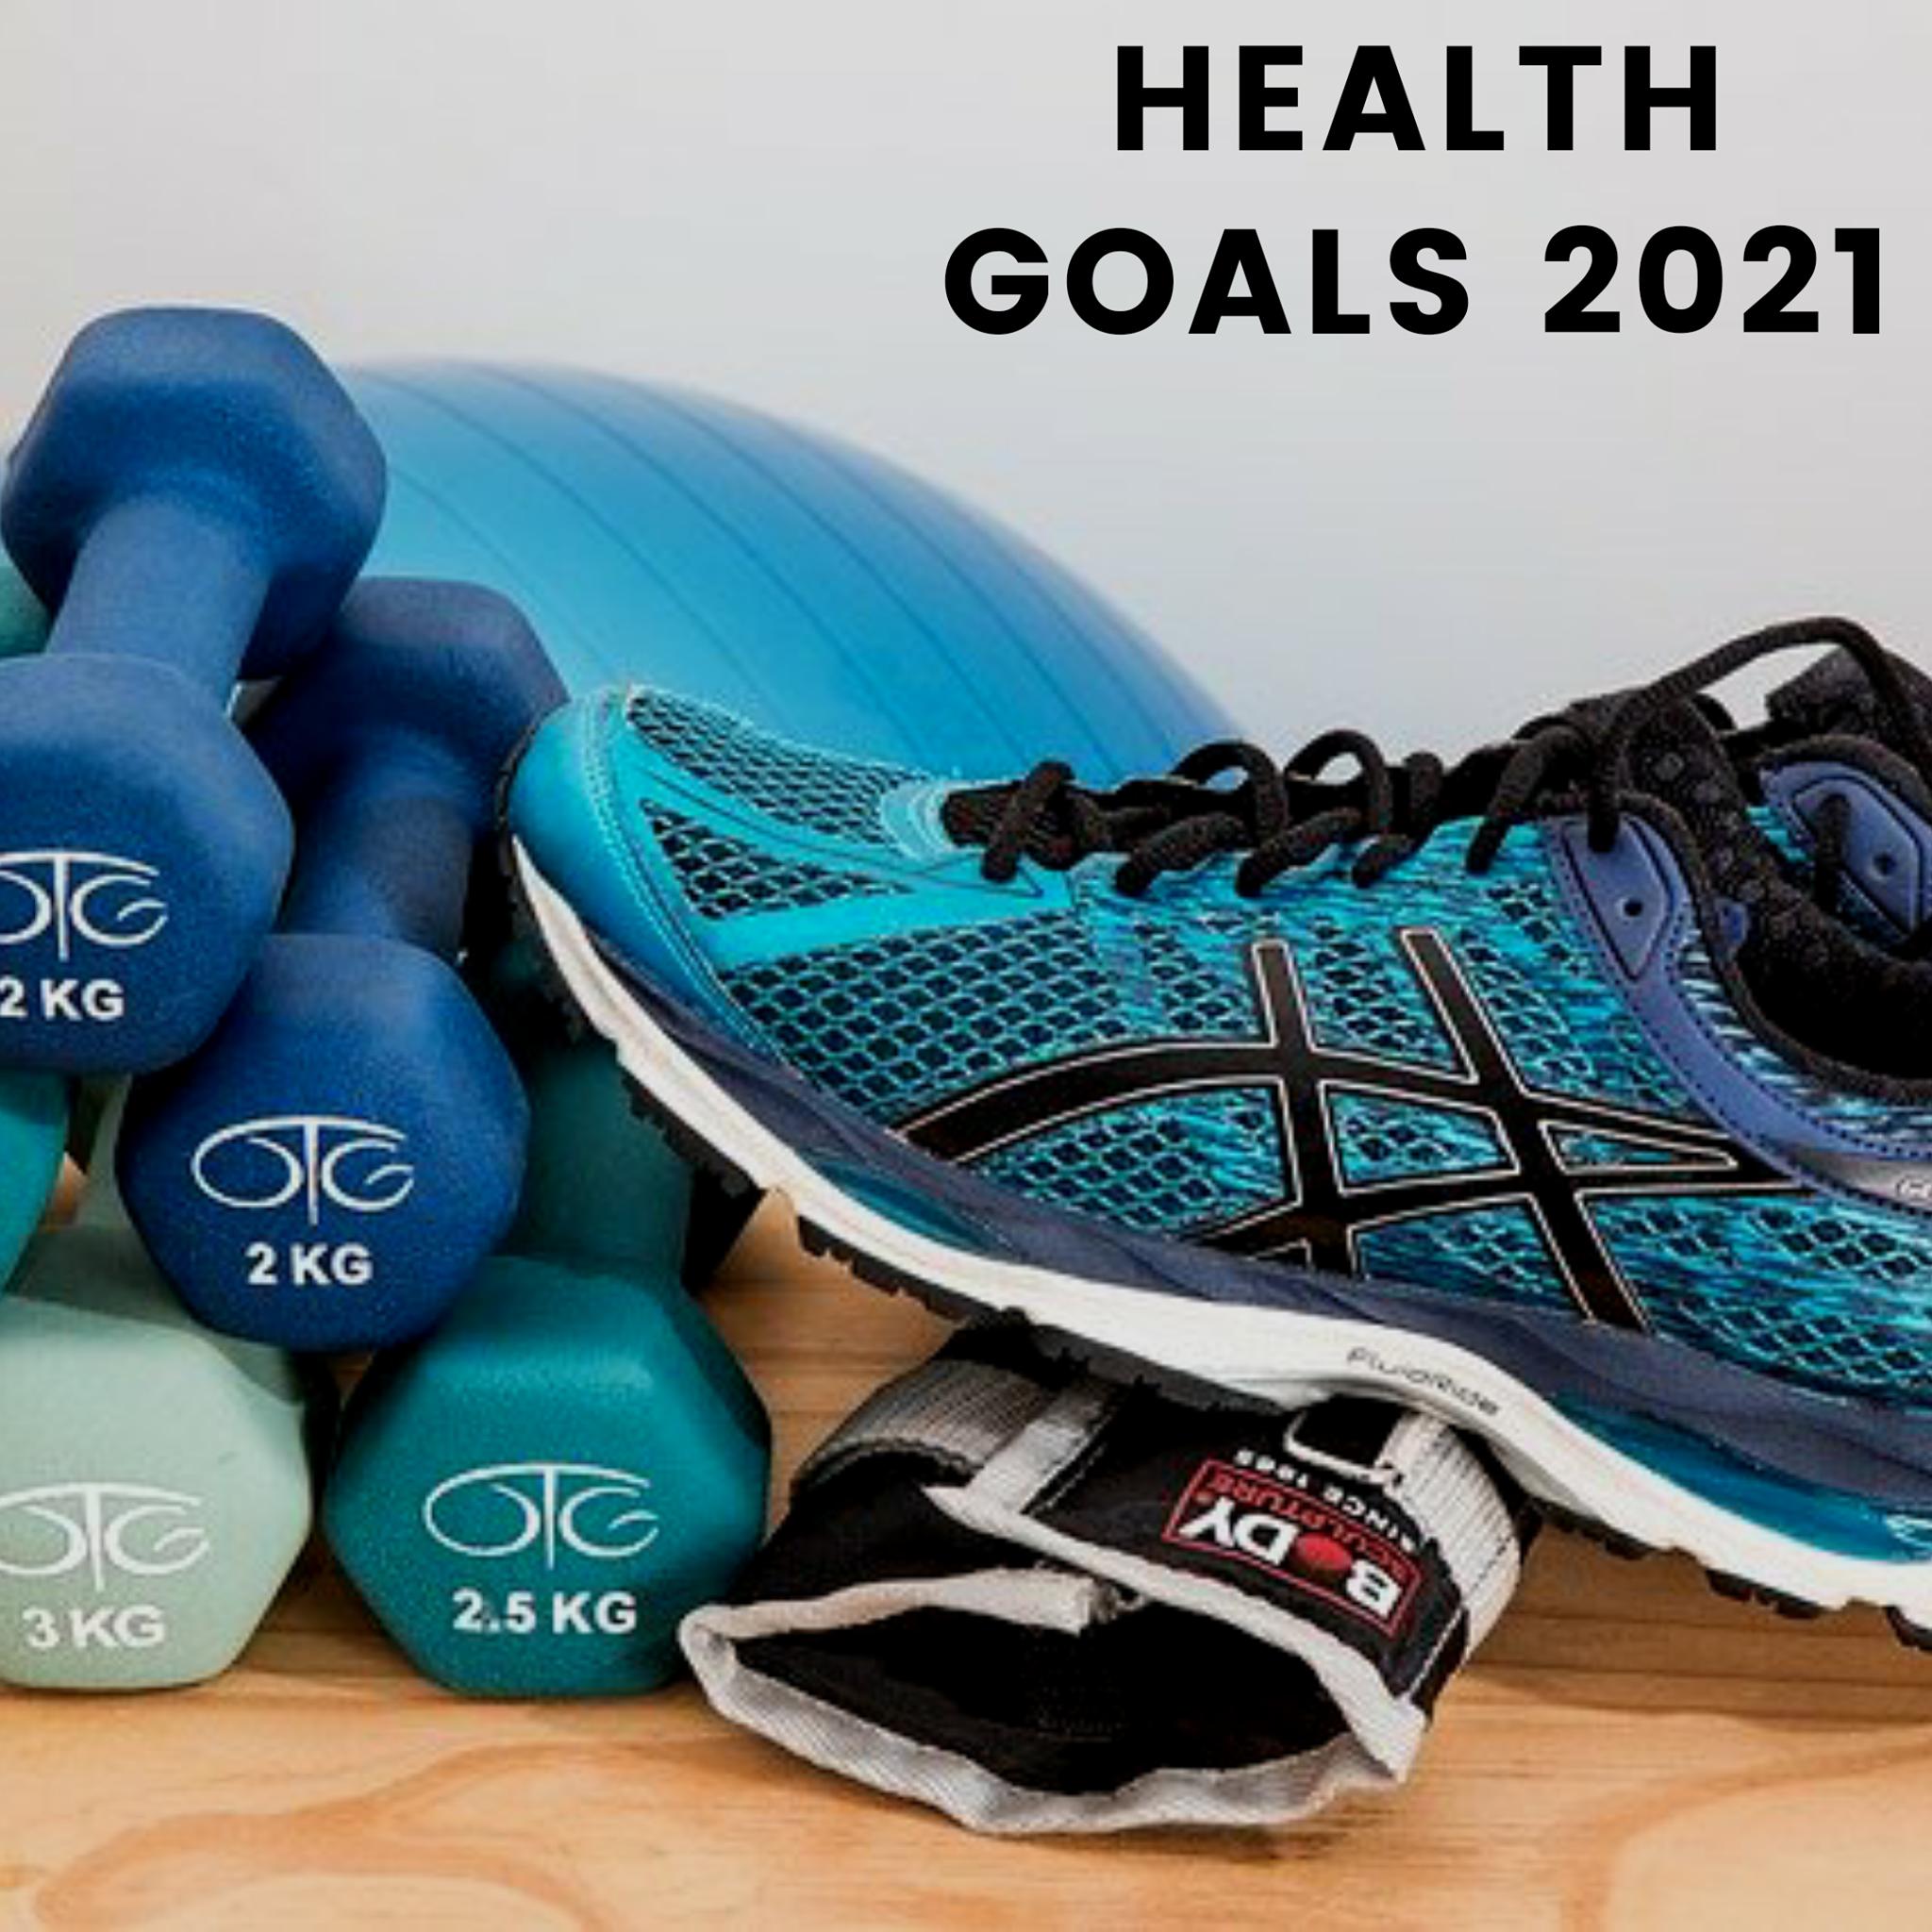 health goals 2021